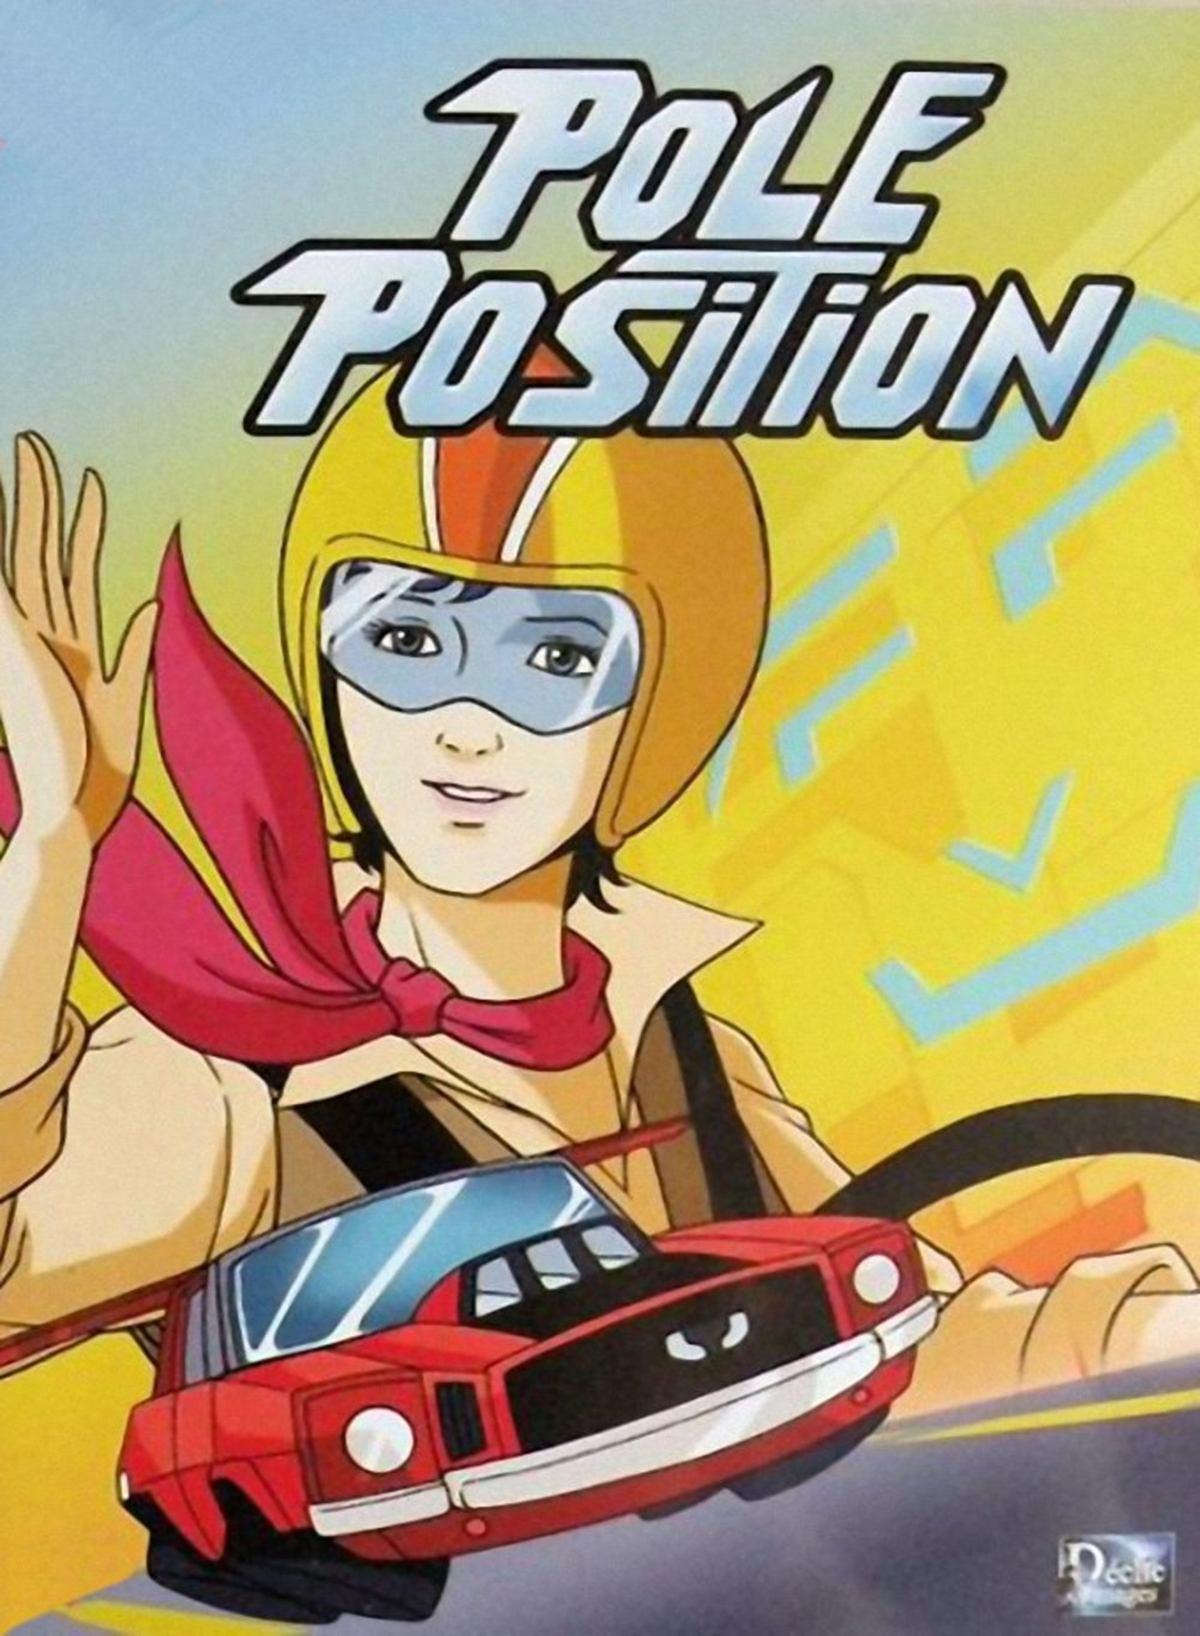 9 13 15 Cartoons All 80s Boys Should Remember